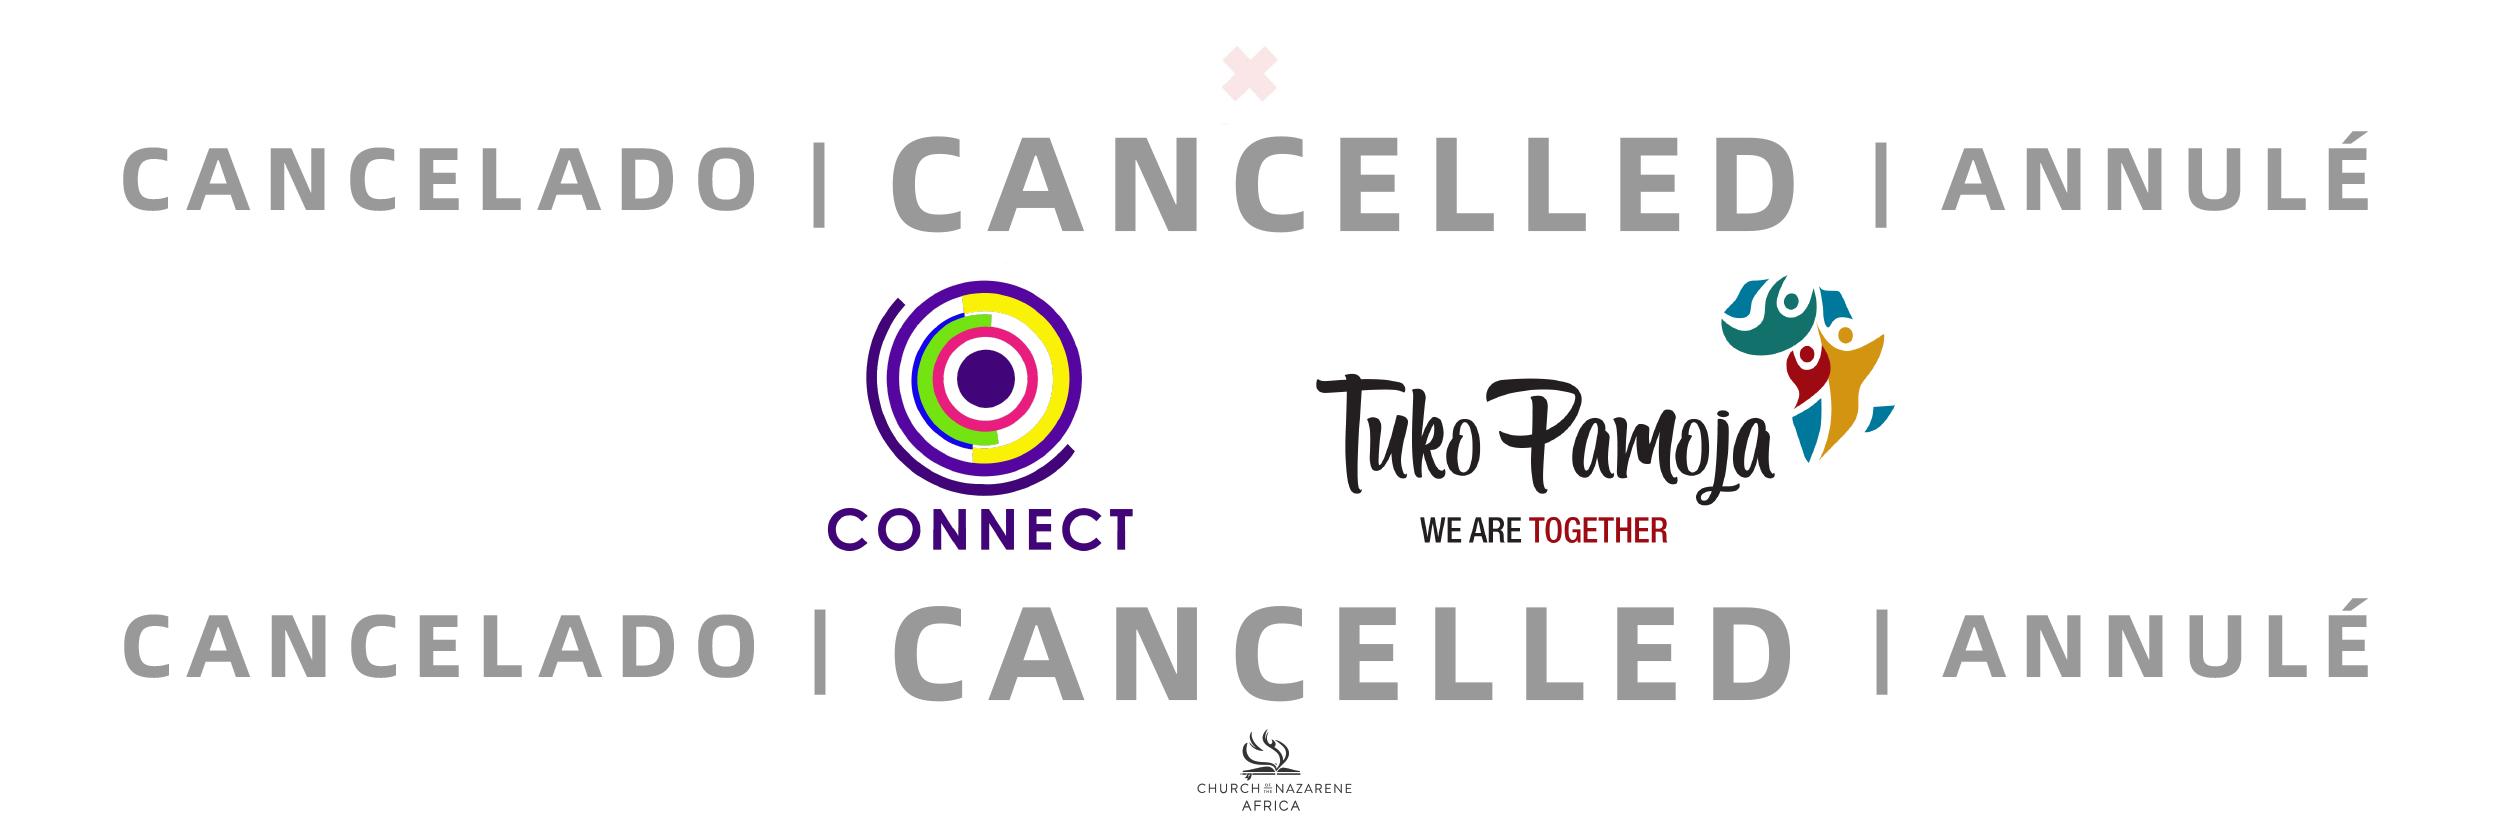 2020 Conferences Cancellation